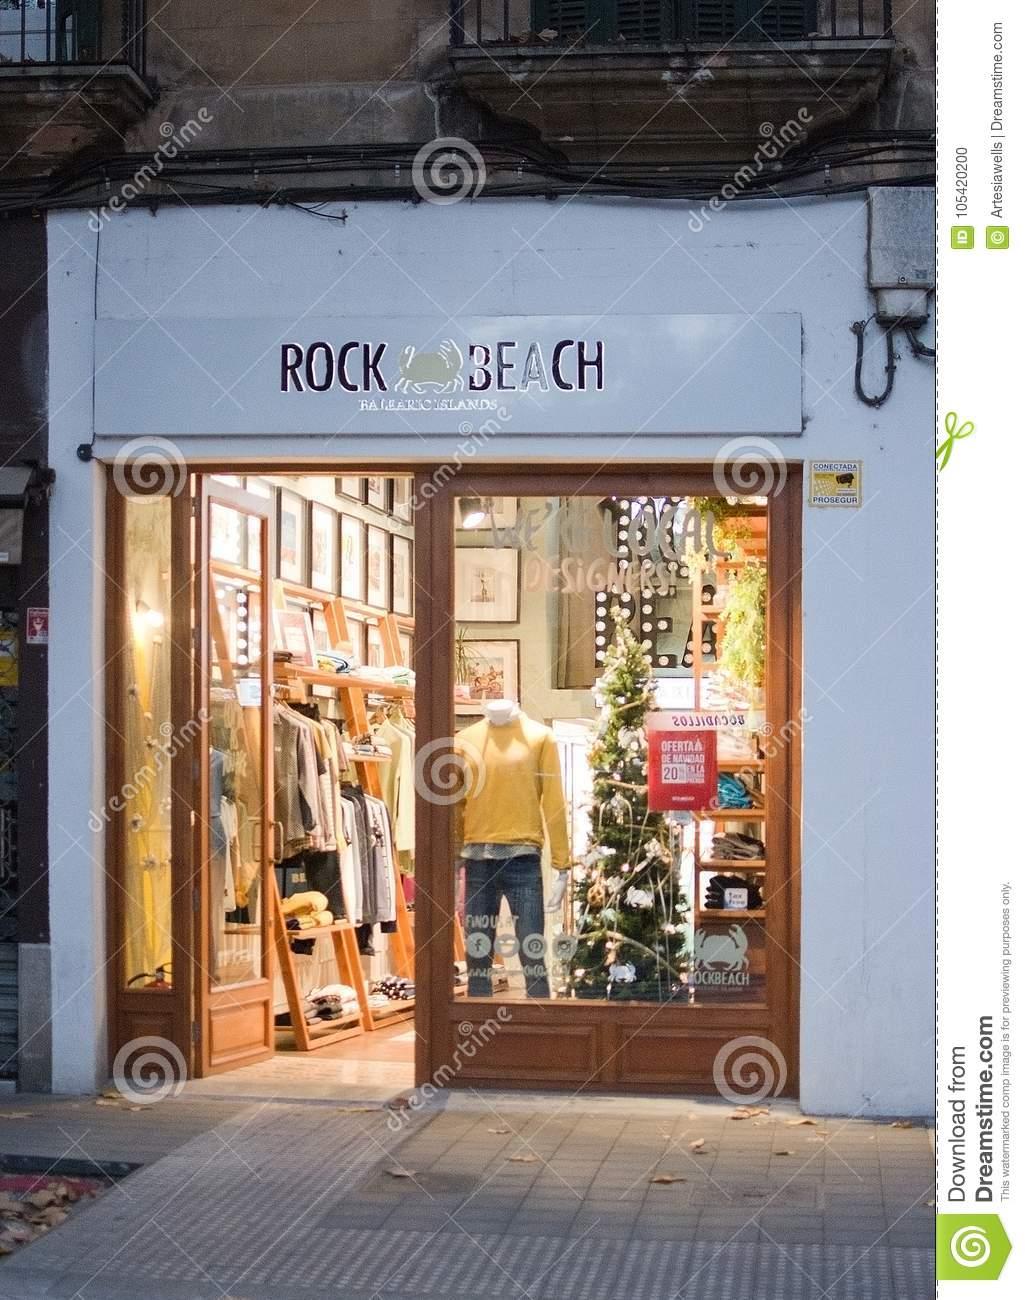 Trh Jardin Del Mar Best Of Rock Beach Boutique Carrer Union Editorial Image Image